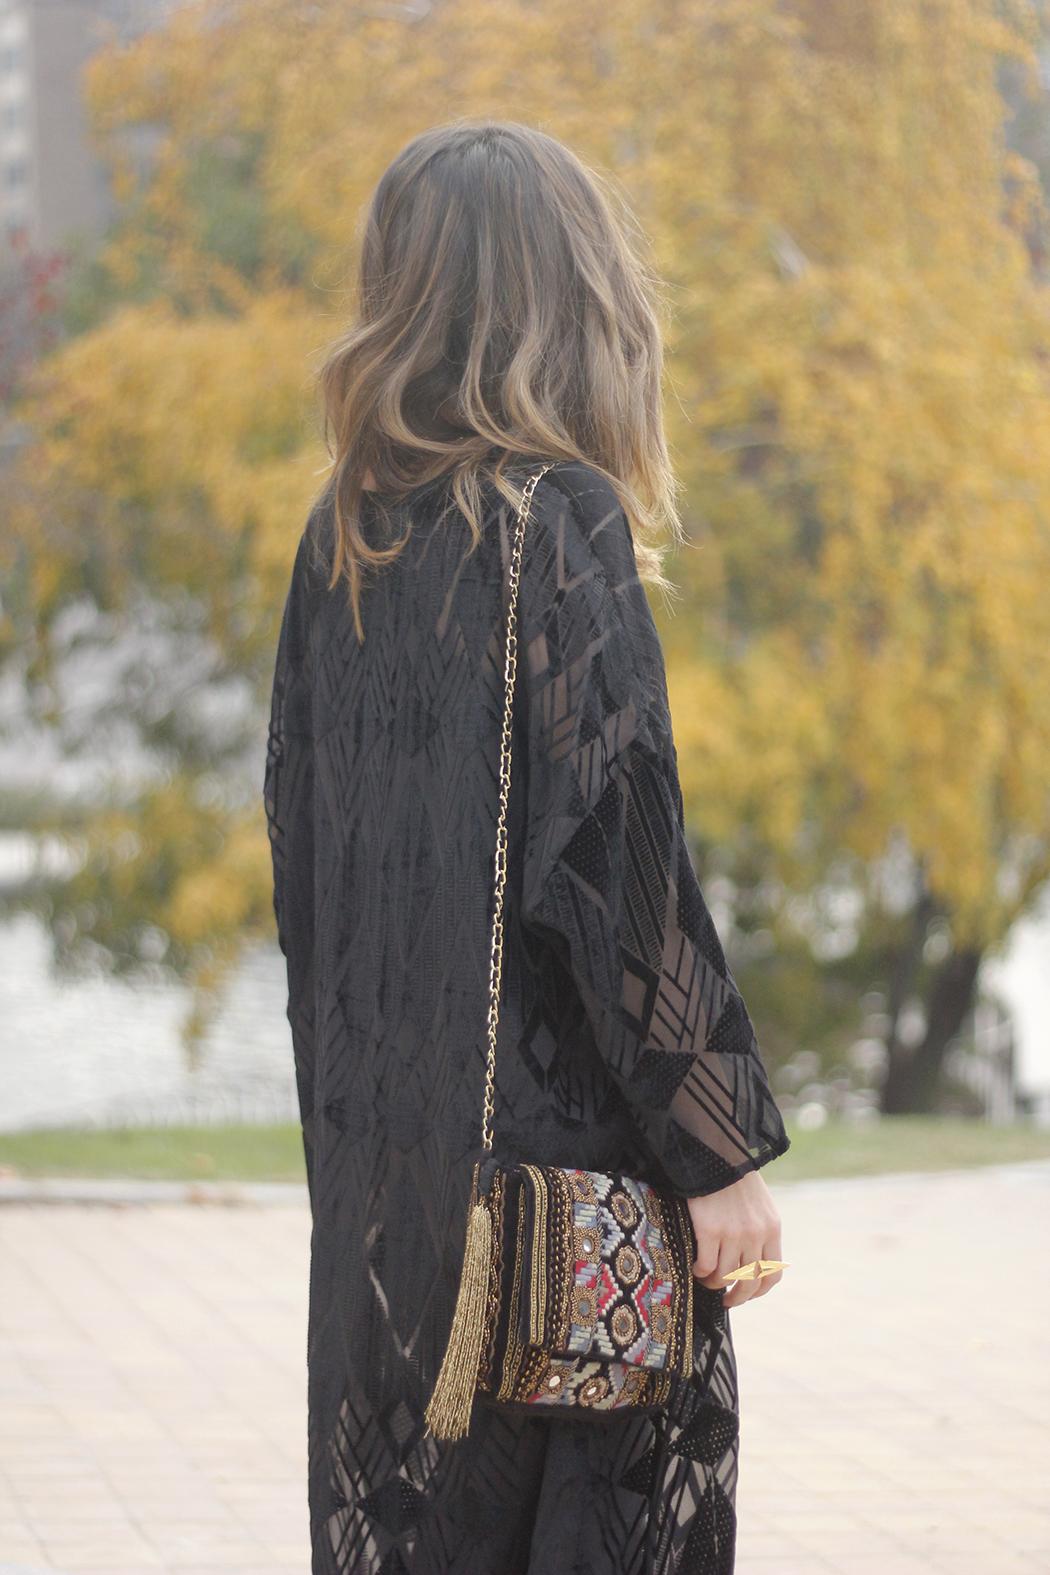 Black Kimono Black flared jeans outfit20